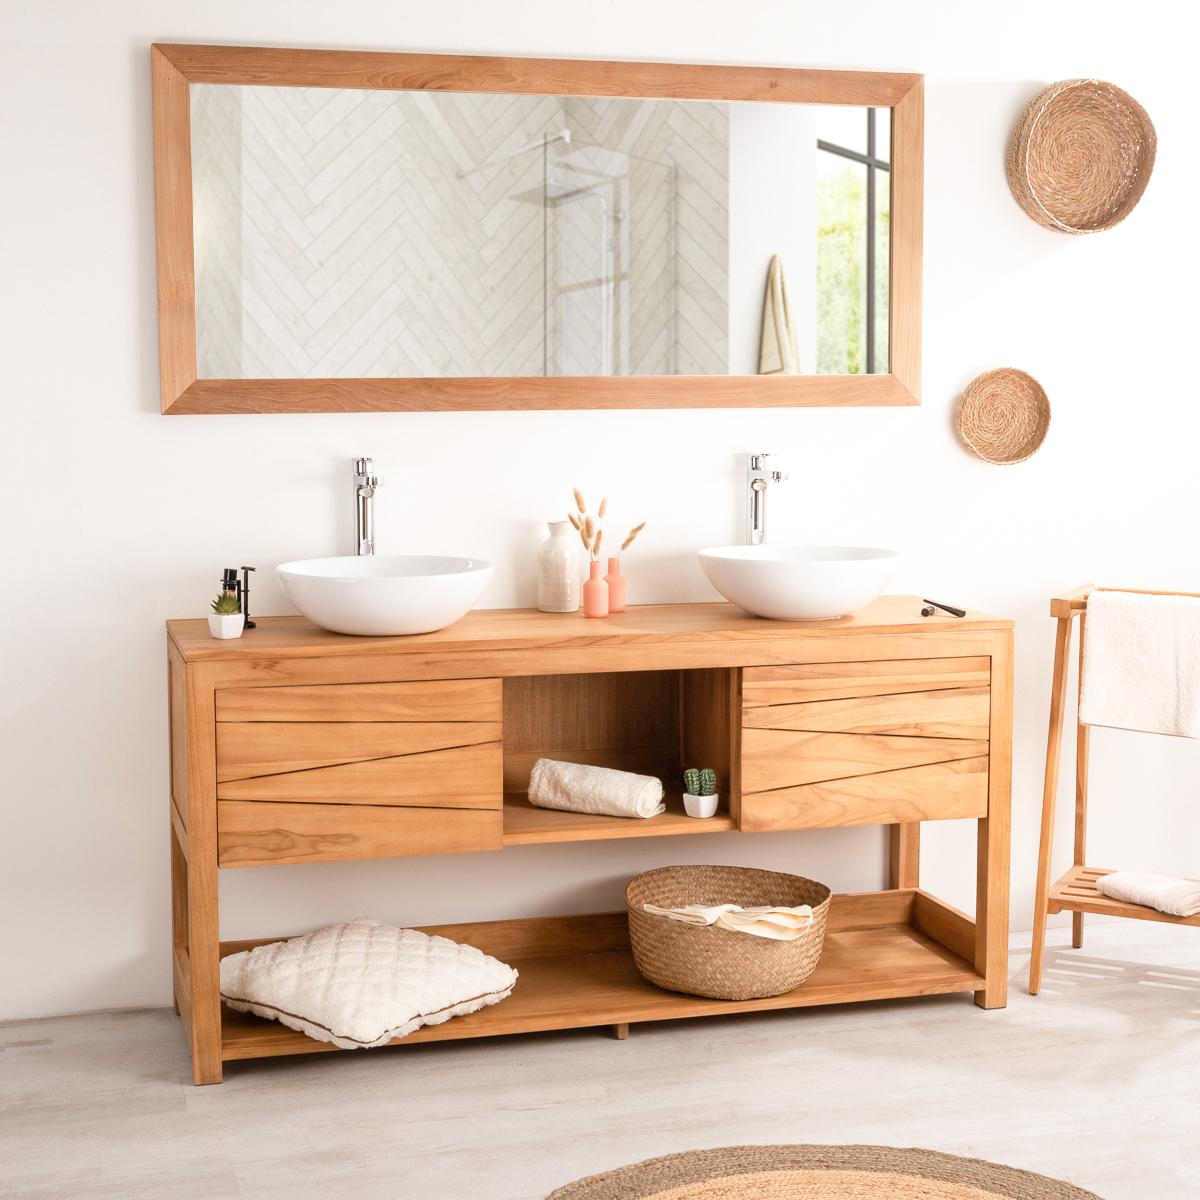 Mueble para lavabo doble de madera teca maciza cosy rect ngulo ancho 160 cm Mueble para lavabo